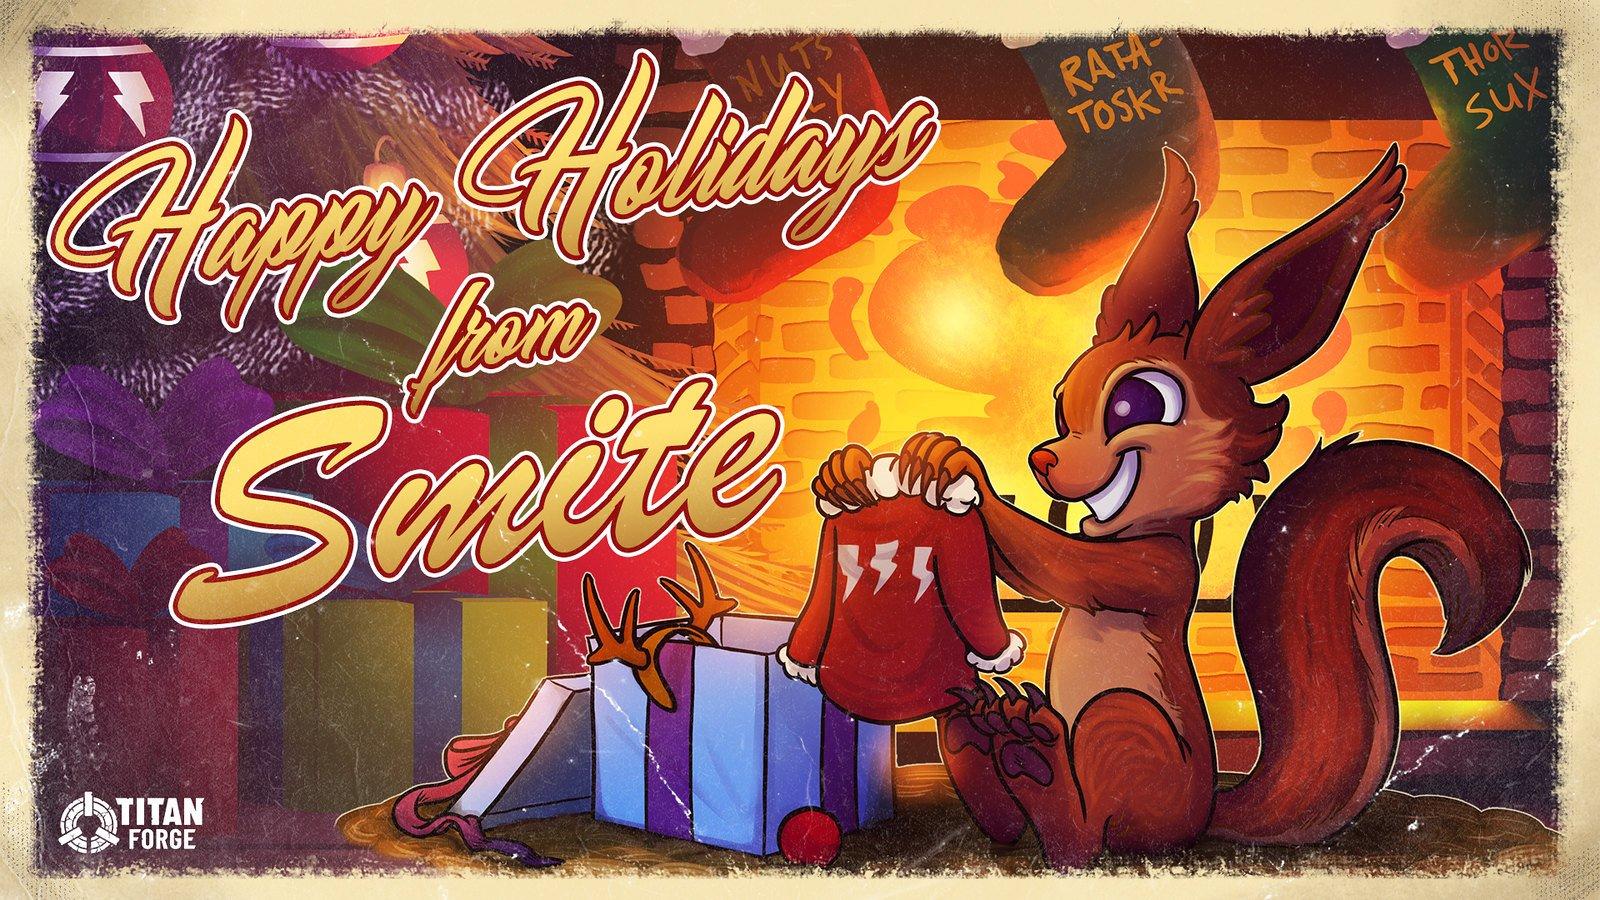 Titan Forge Happy Holidays wallpaper theme